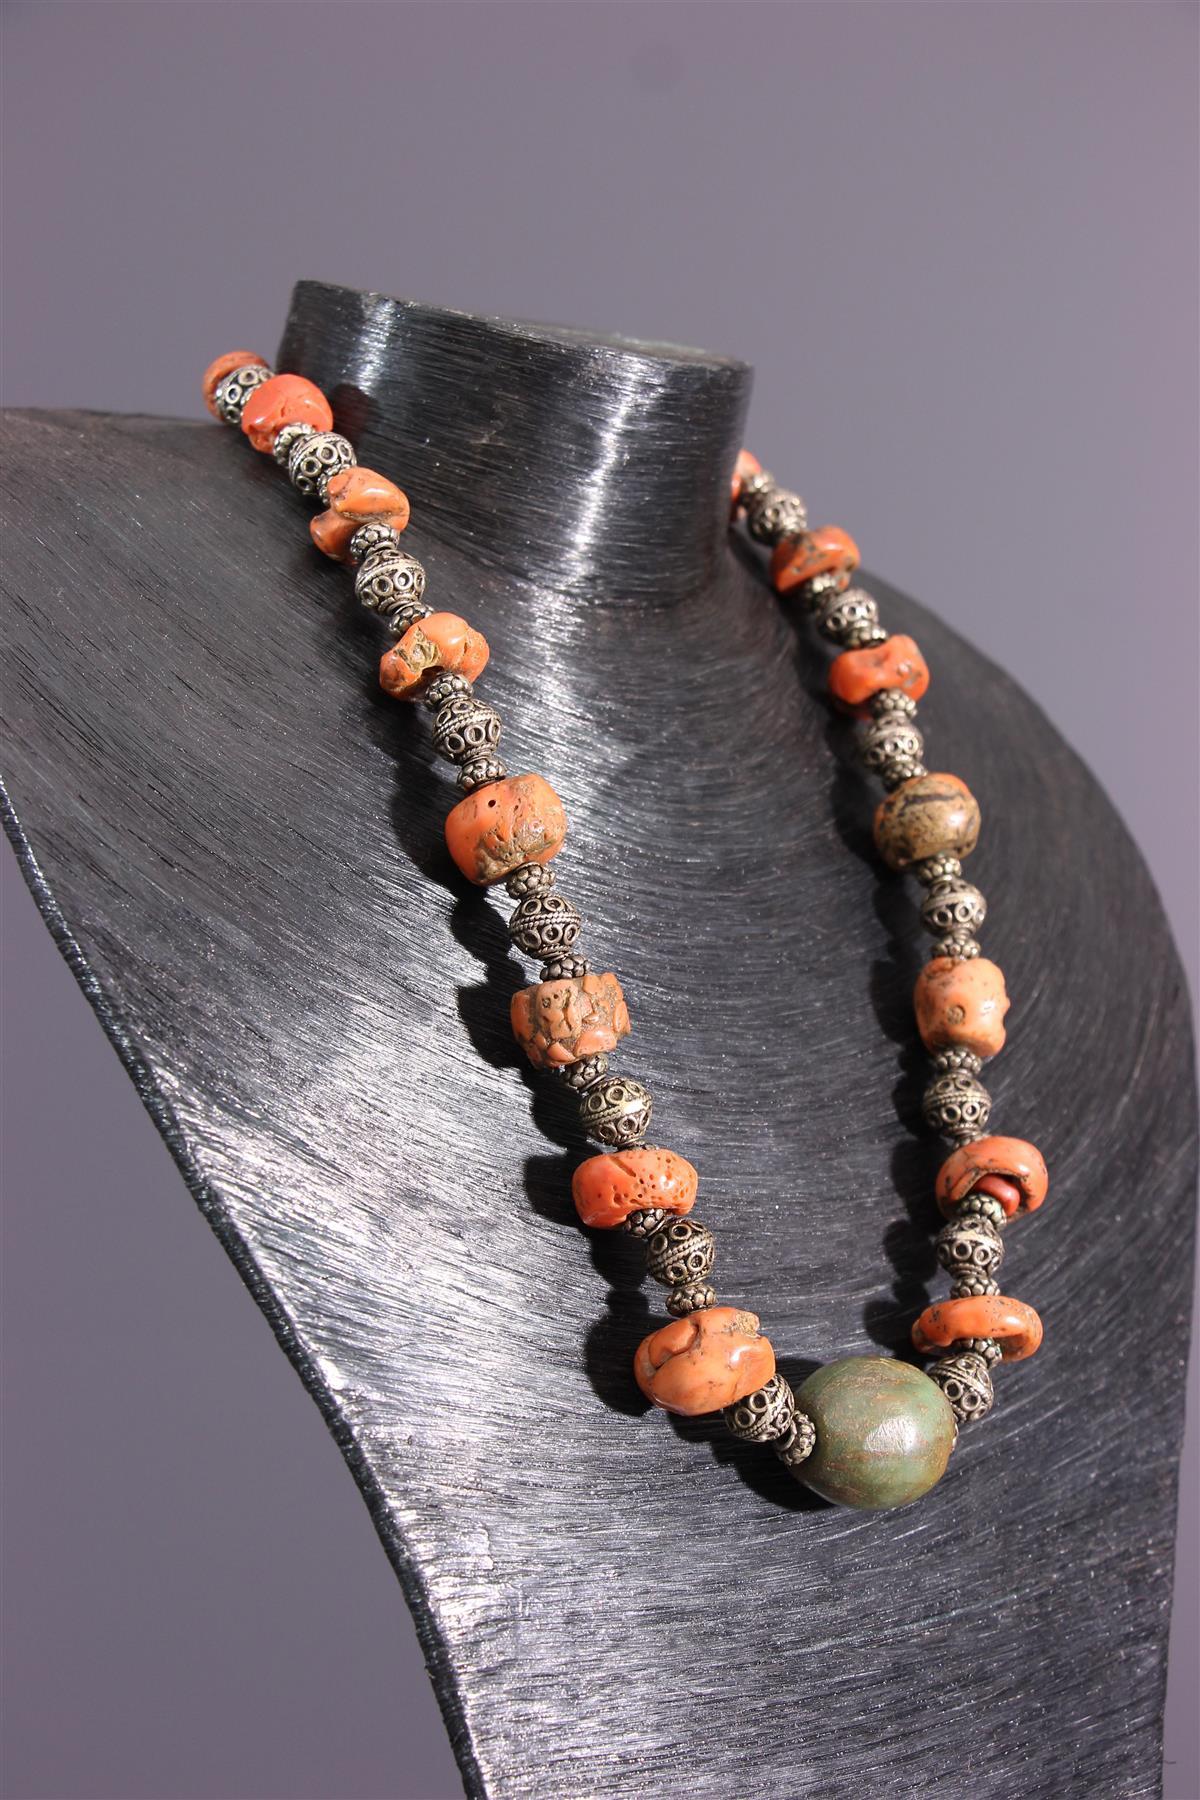 Amazigh necklace - African art